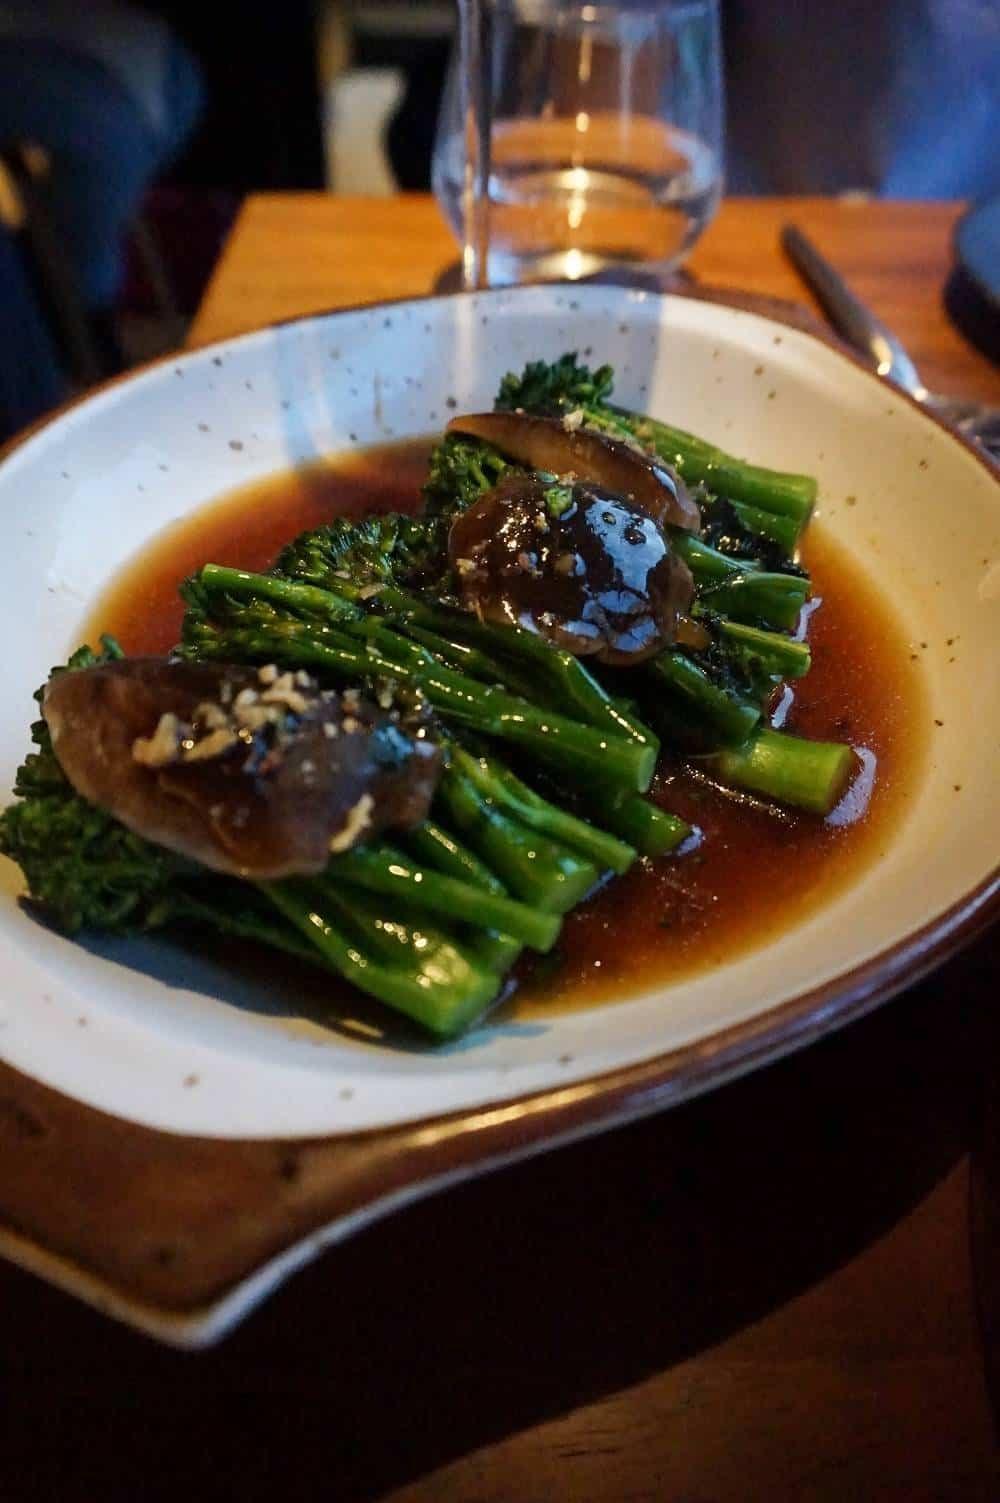 Broccoli with shitake mushrooms from Patara